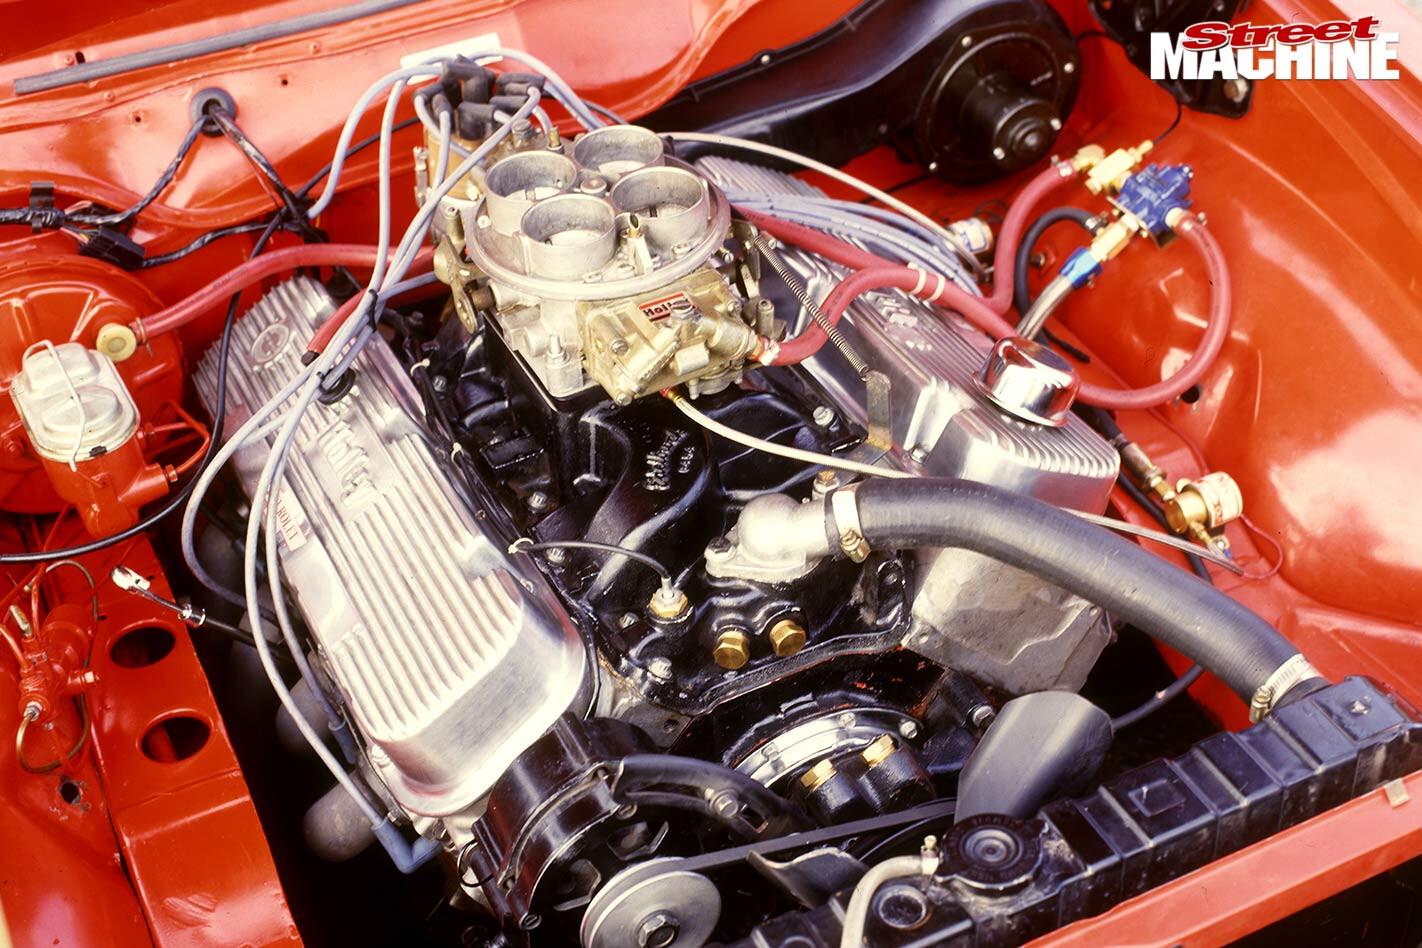 Holden Torana A9X engine bay